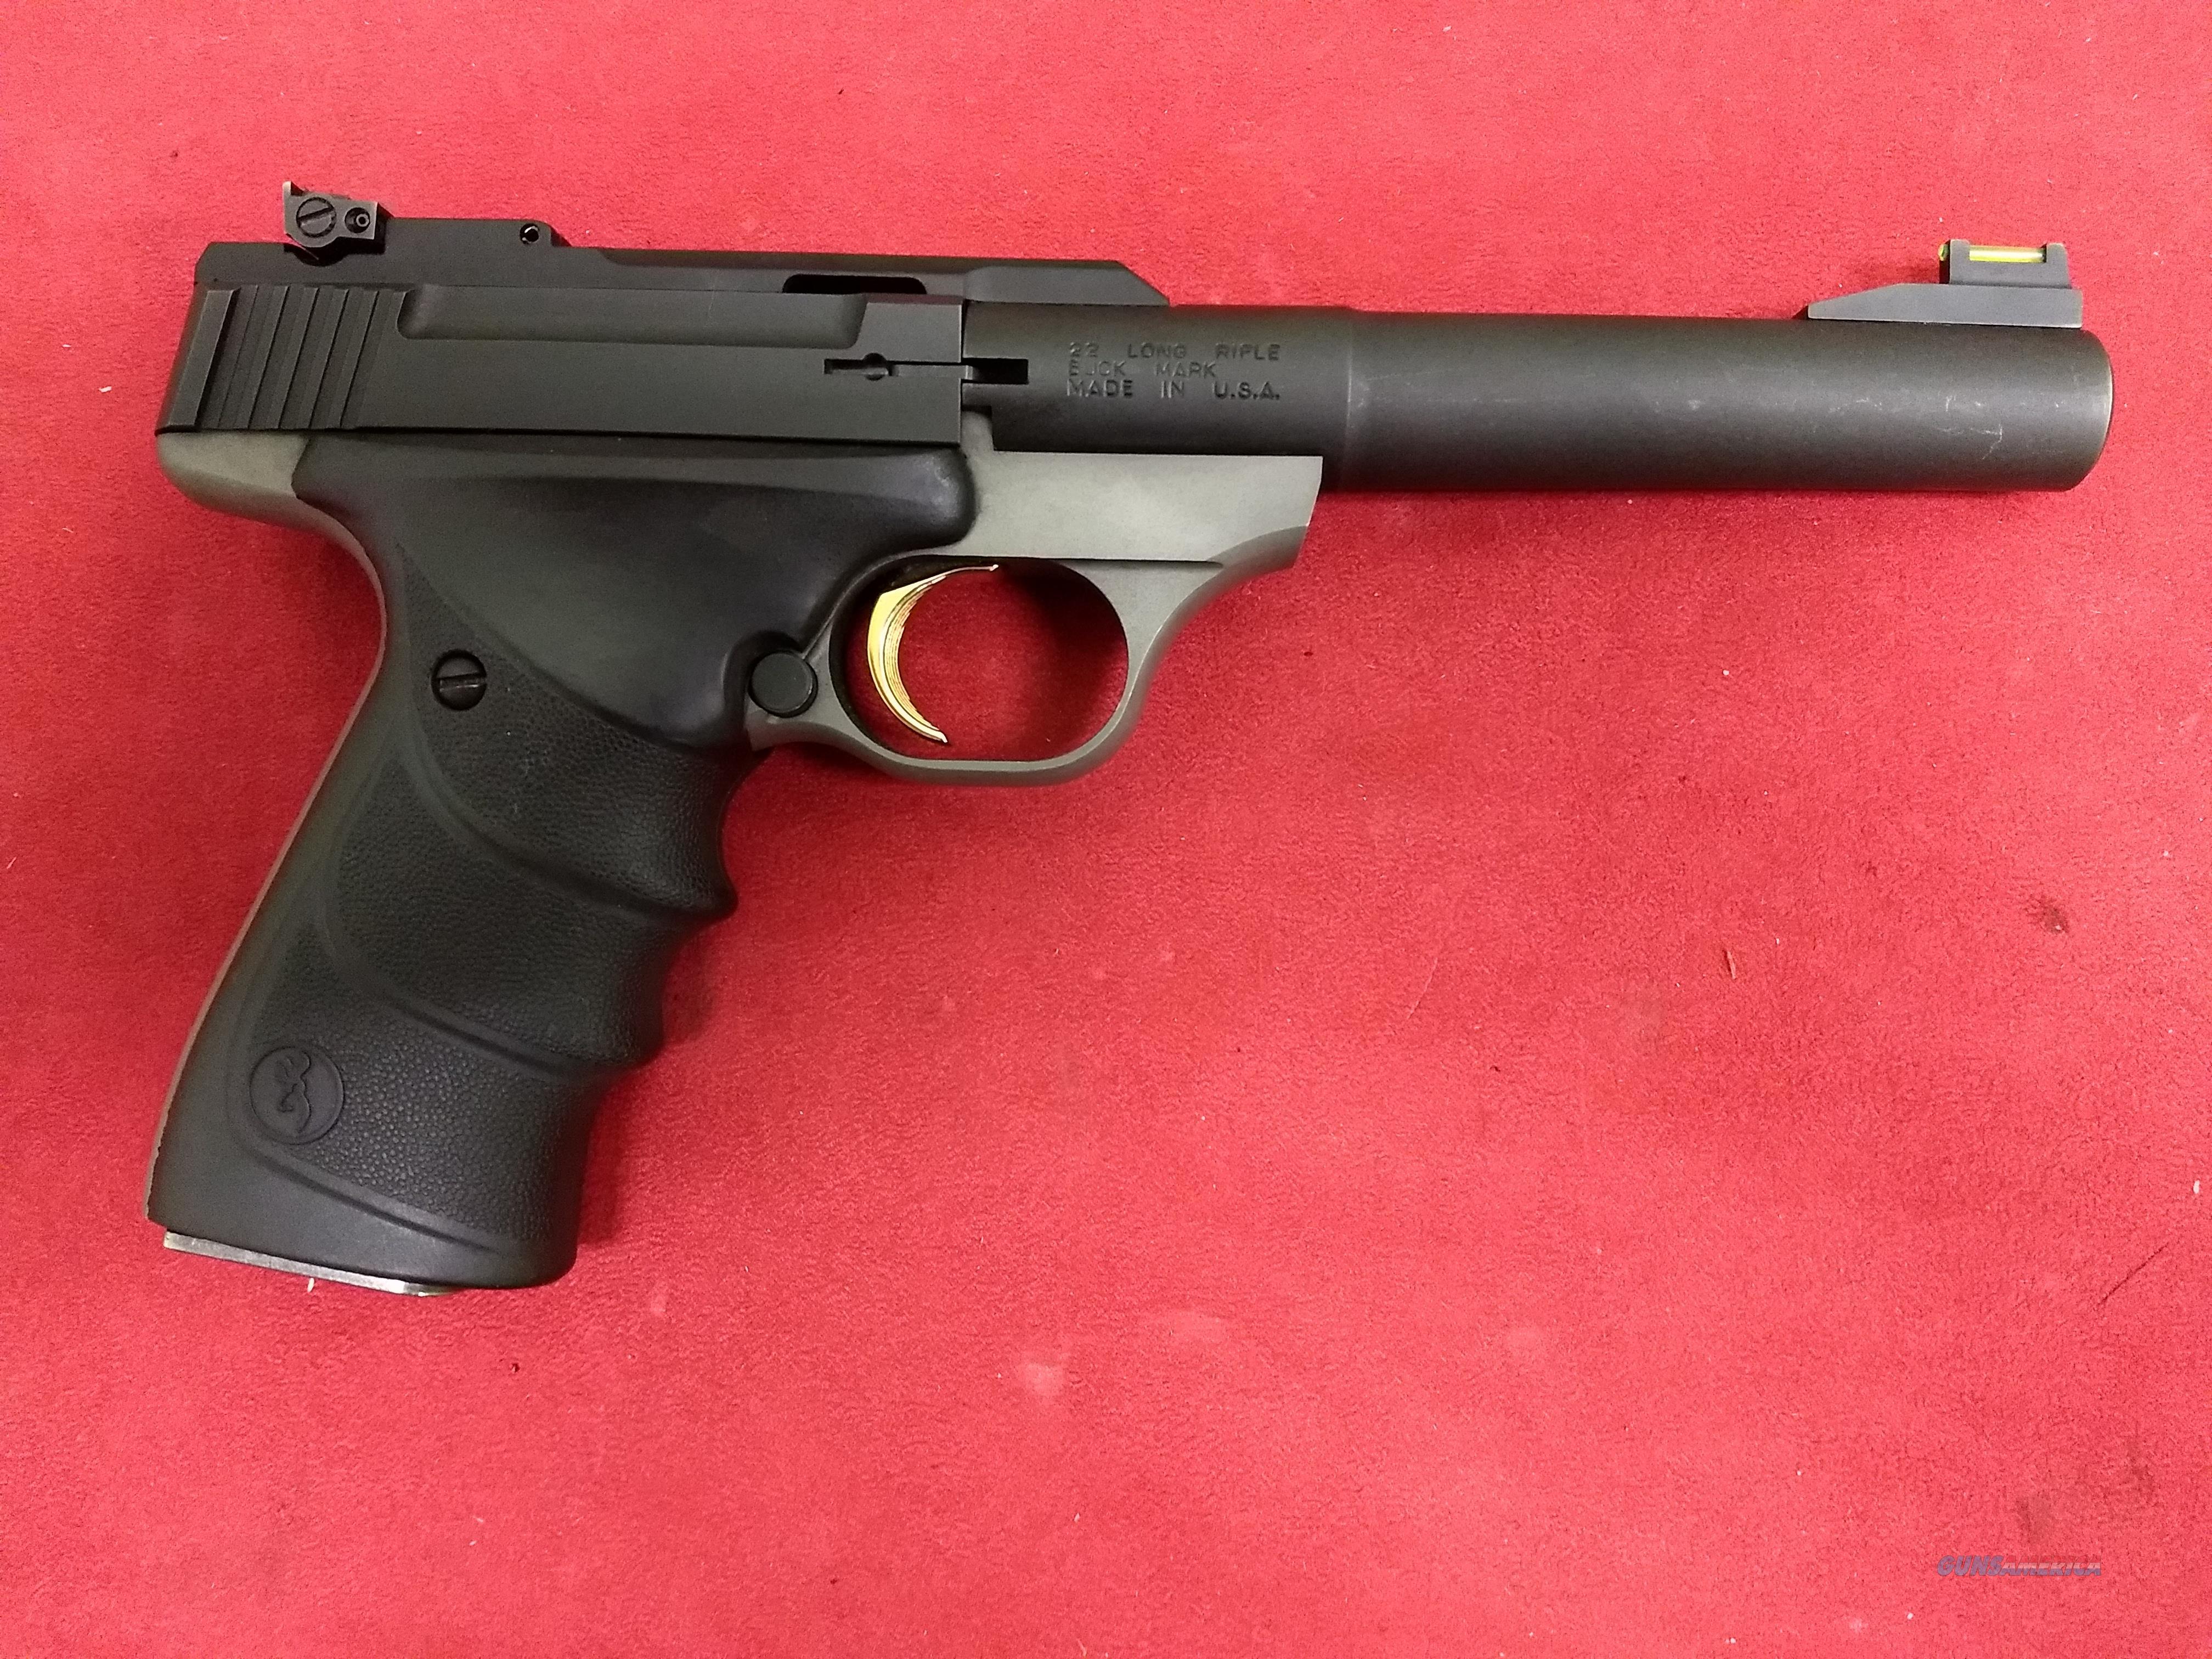 Browning Buck Mark, .22 LR, Gently Used  Guns > Pistols > Browning Pistols > Buckmark